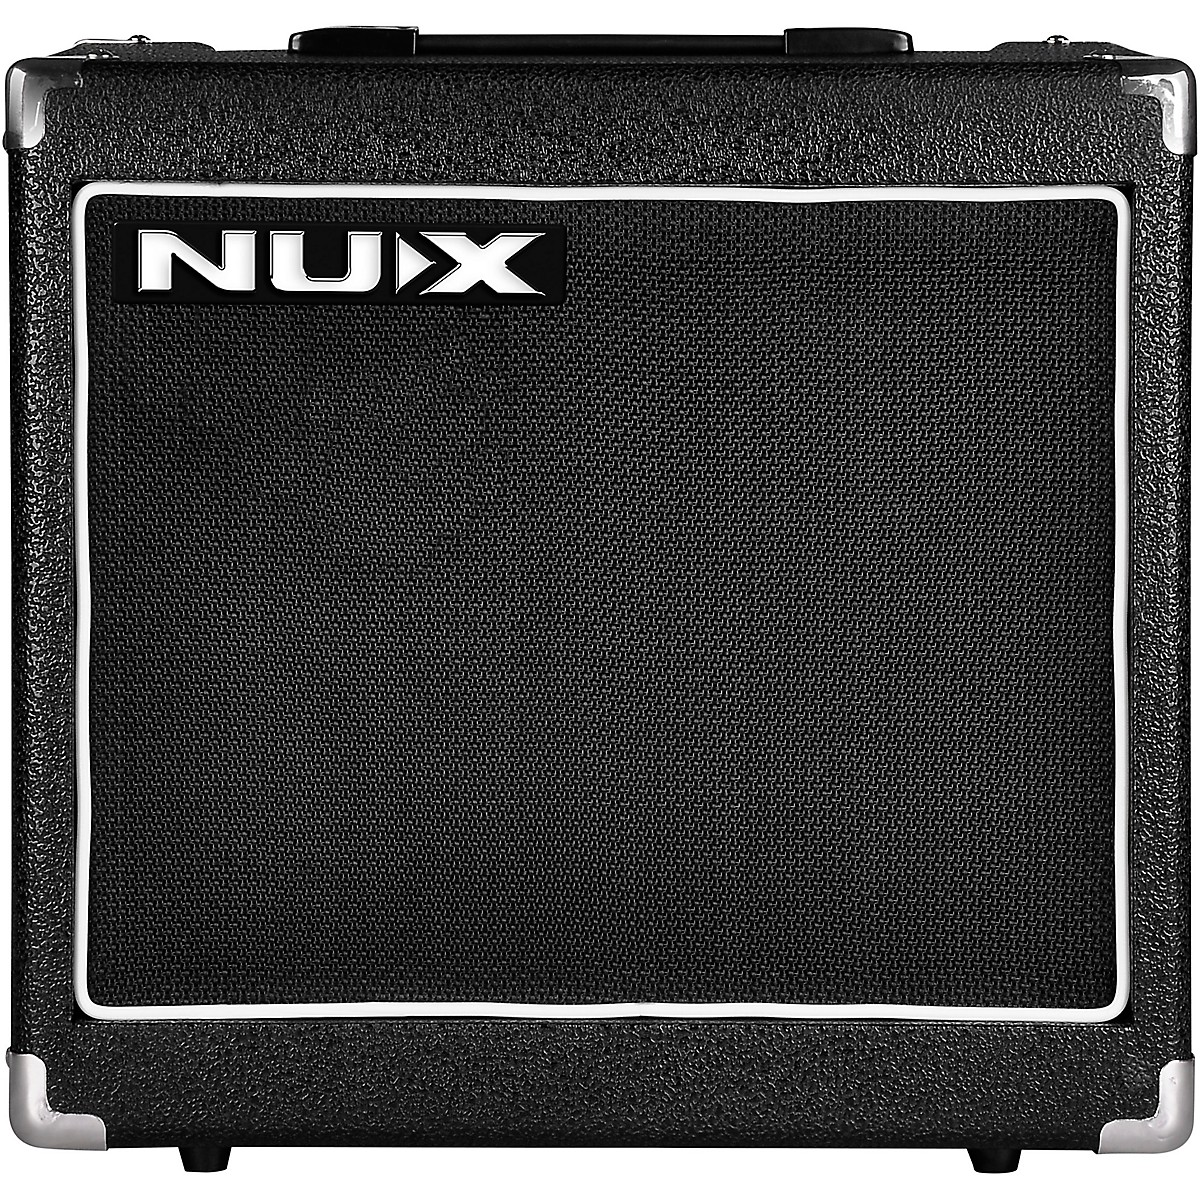 NUX MIGHTY 15SE Digital Guitar Amplifier